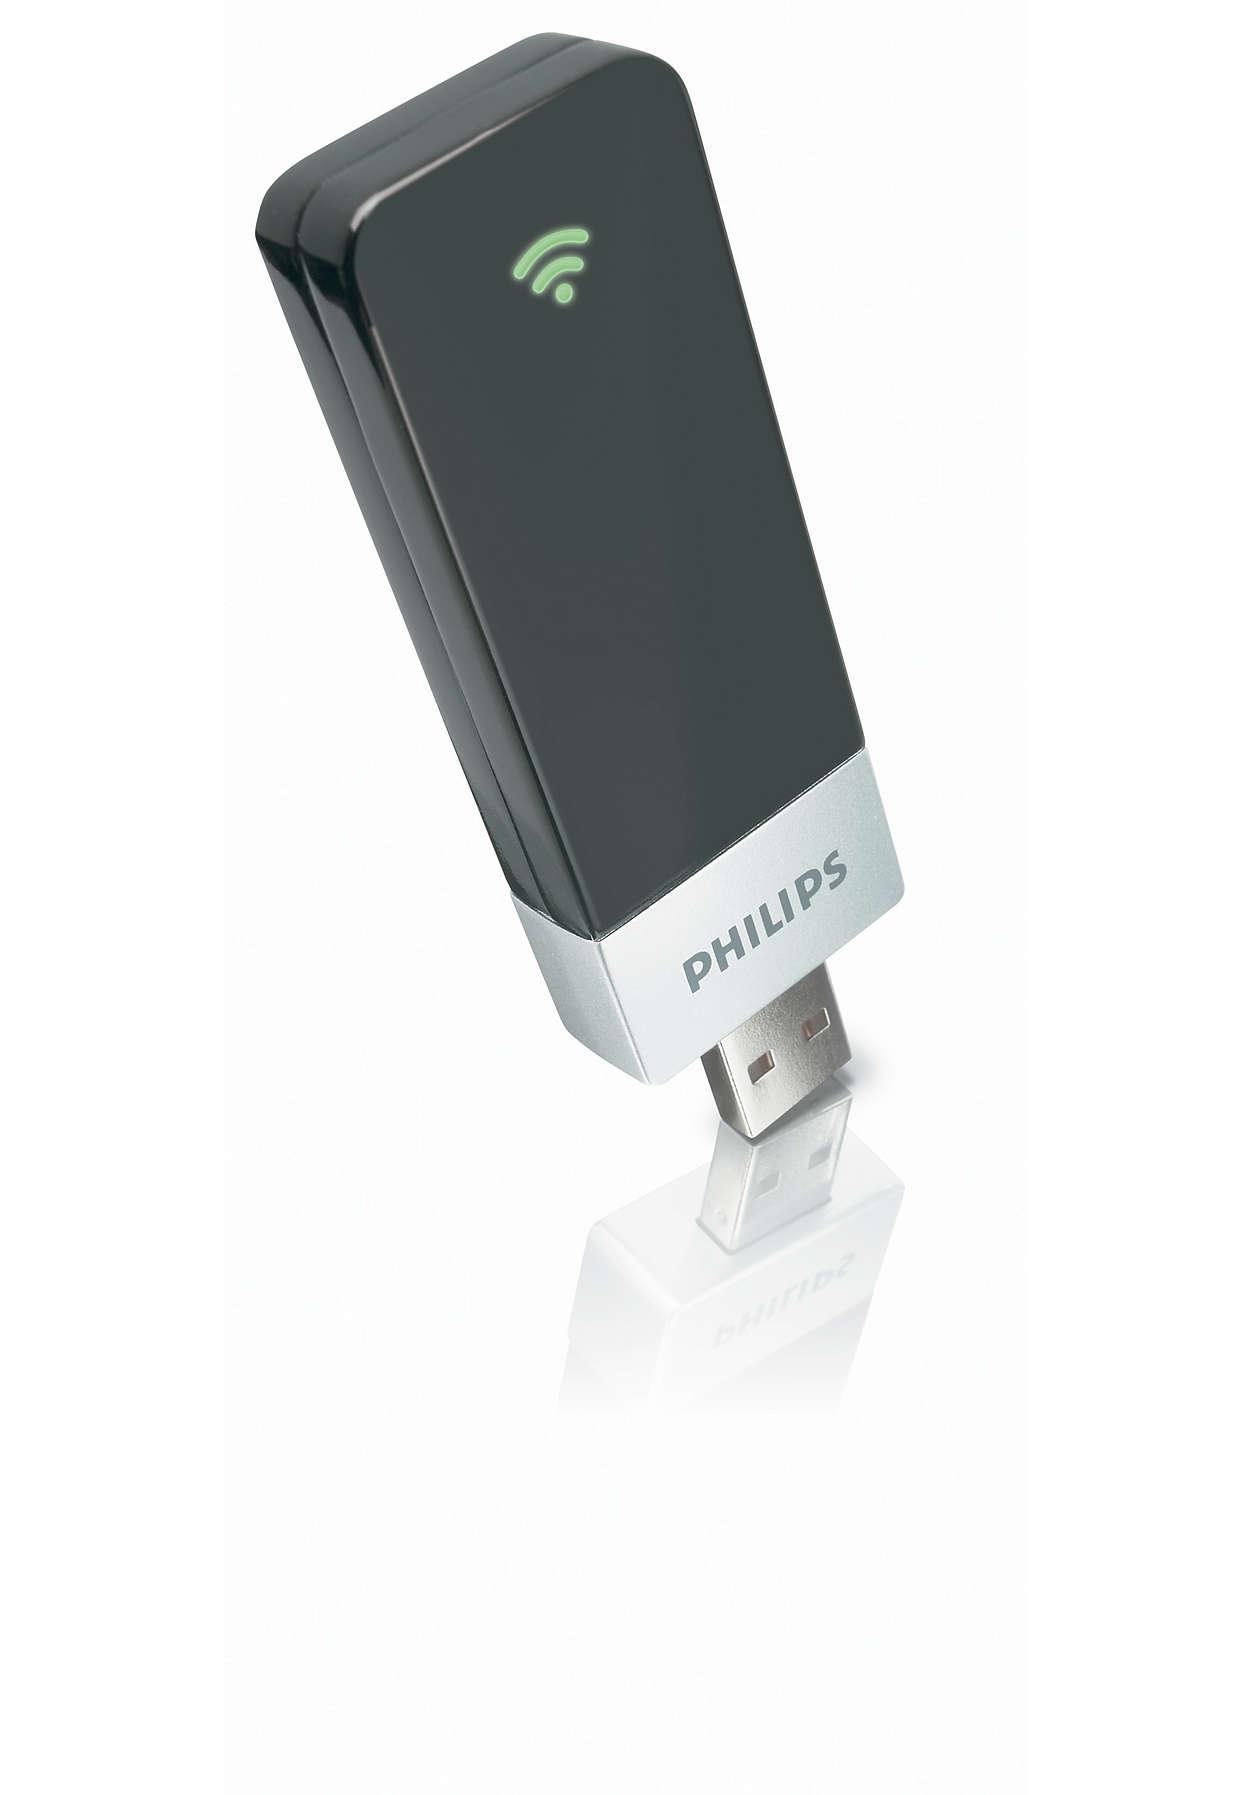 Draadloze USB-adapter